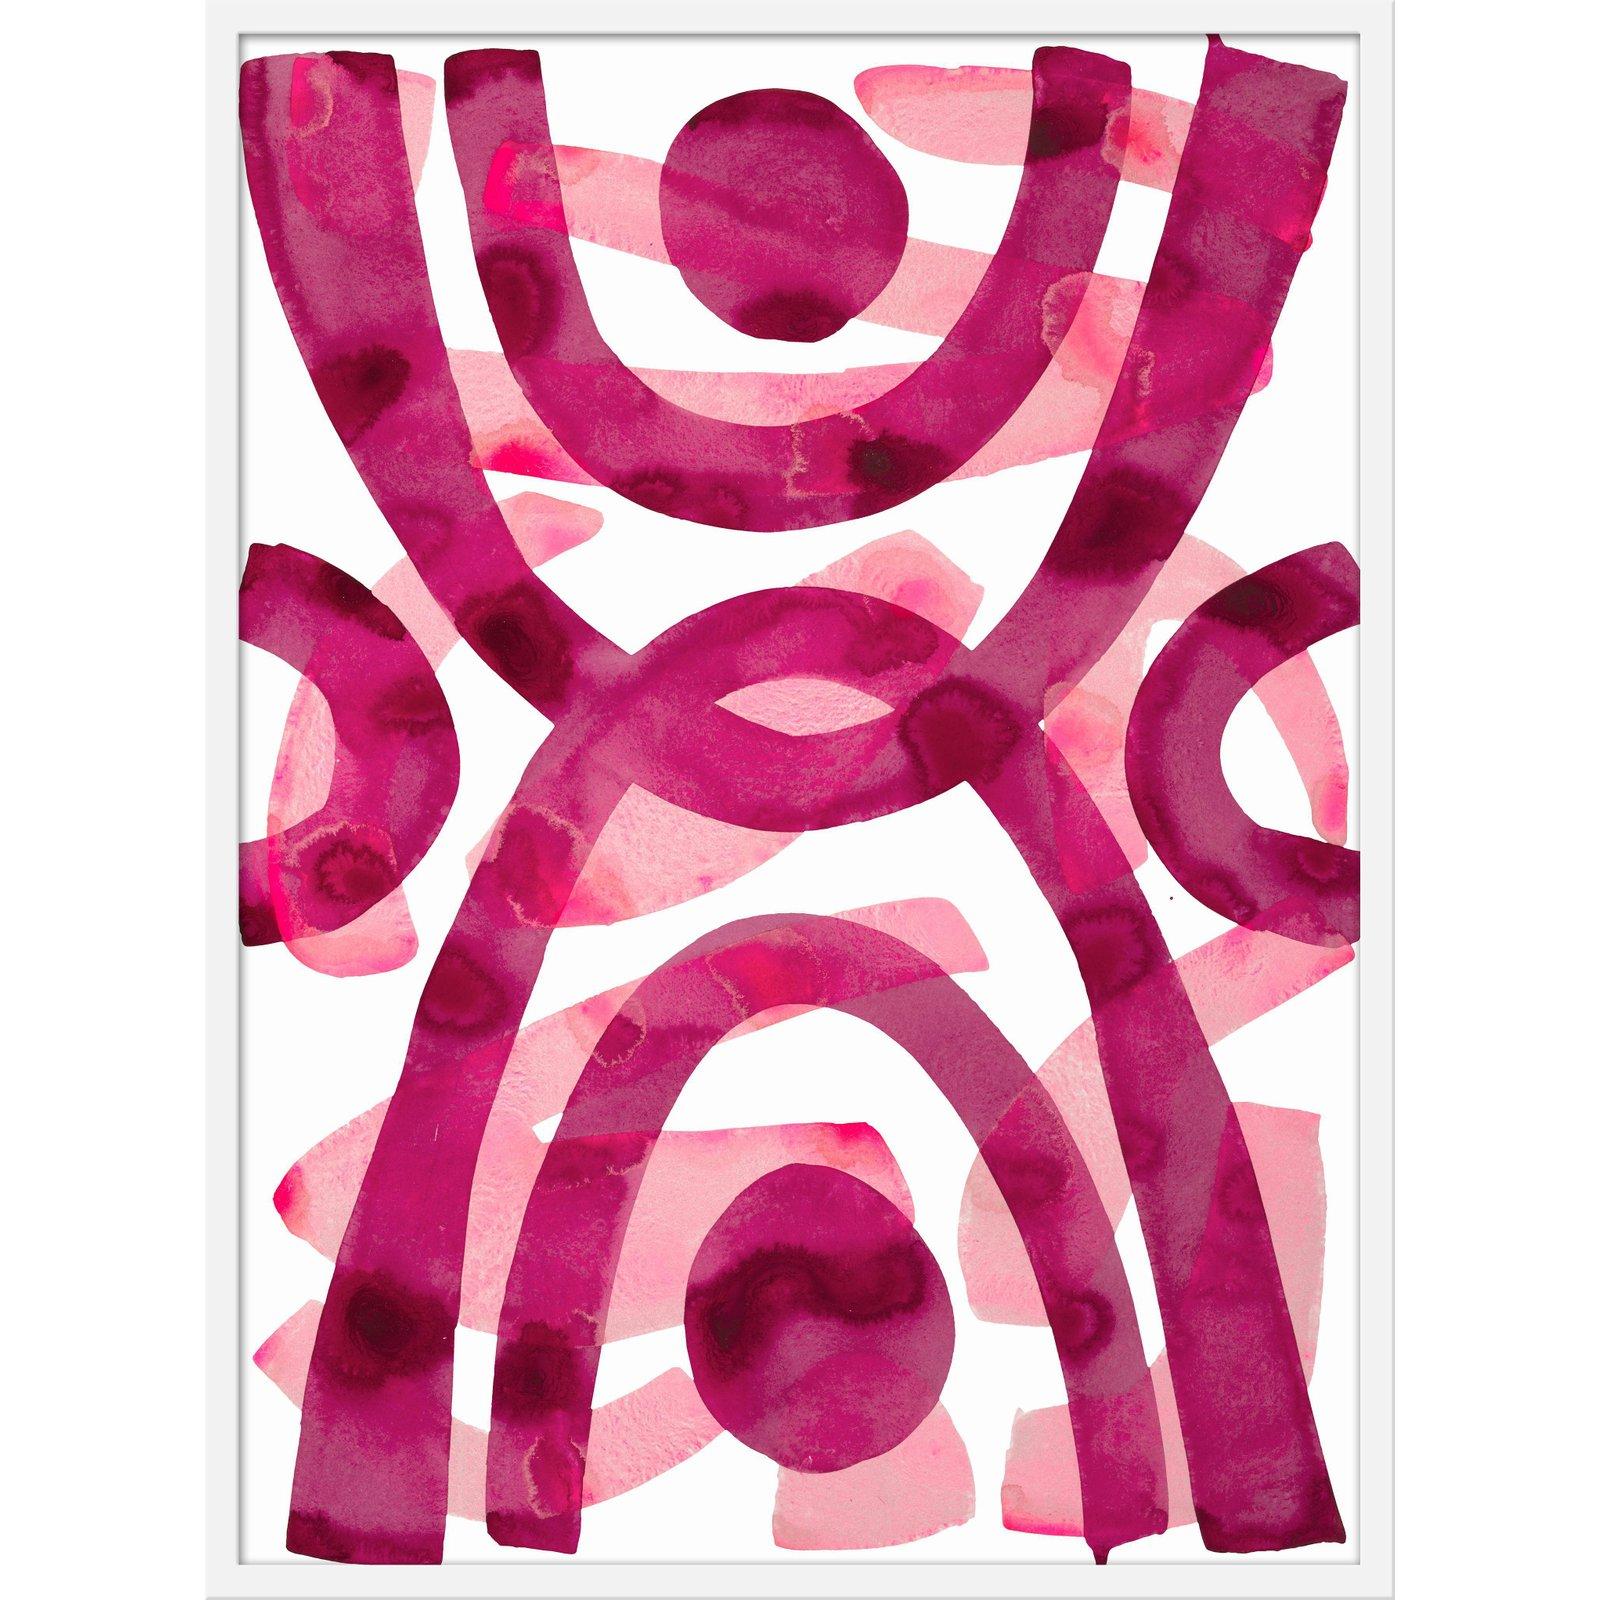 Chairish Print Shop - Artist Kate Roebuck